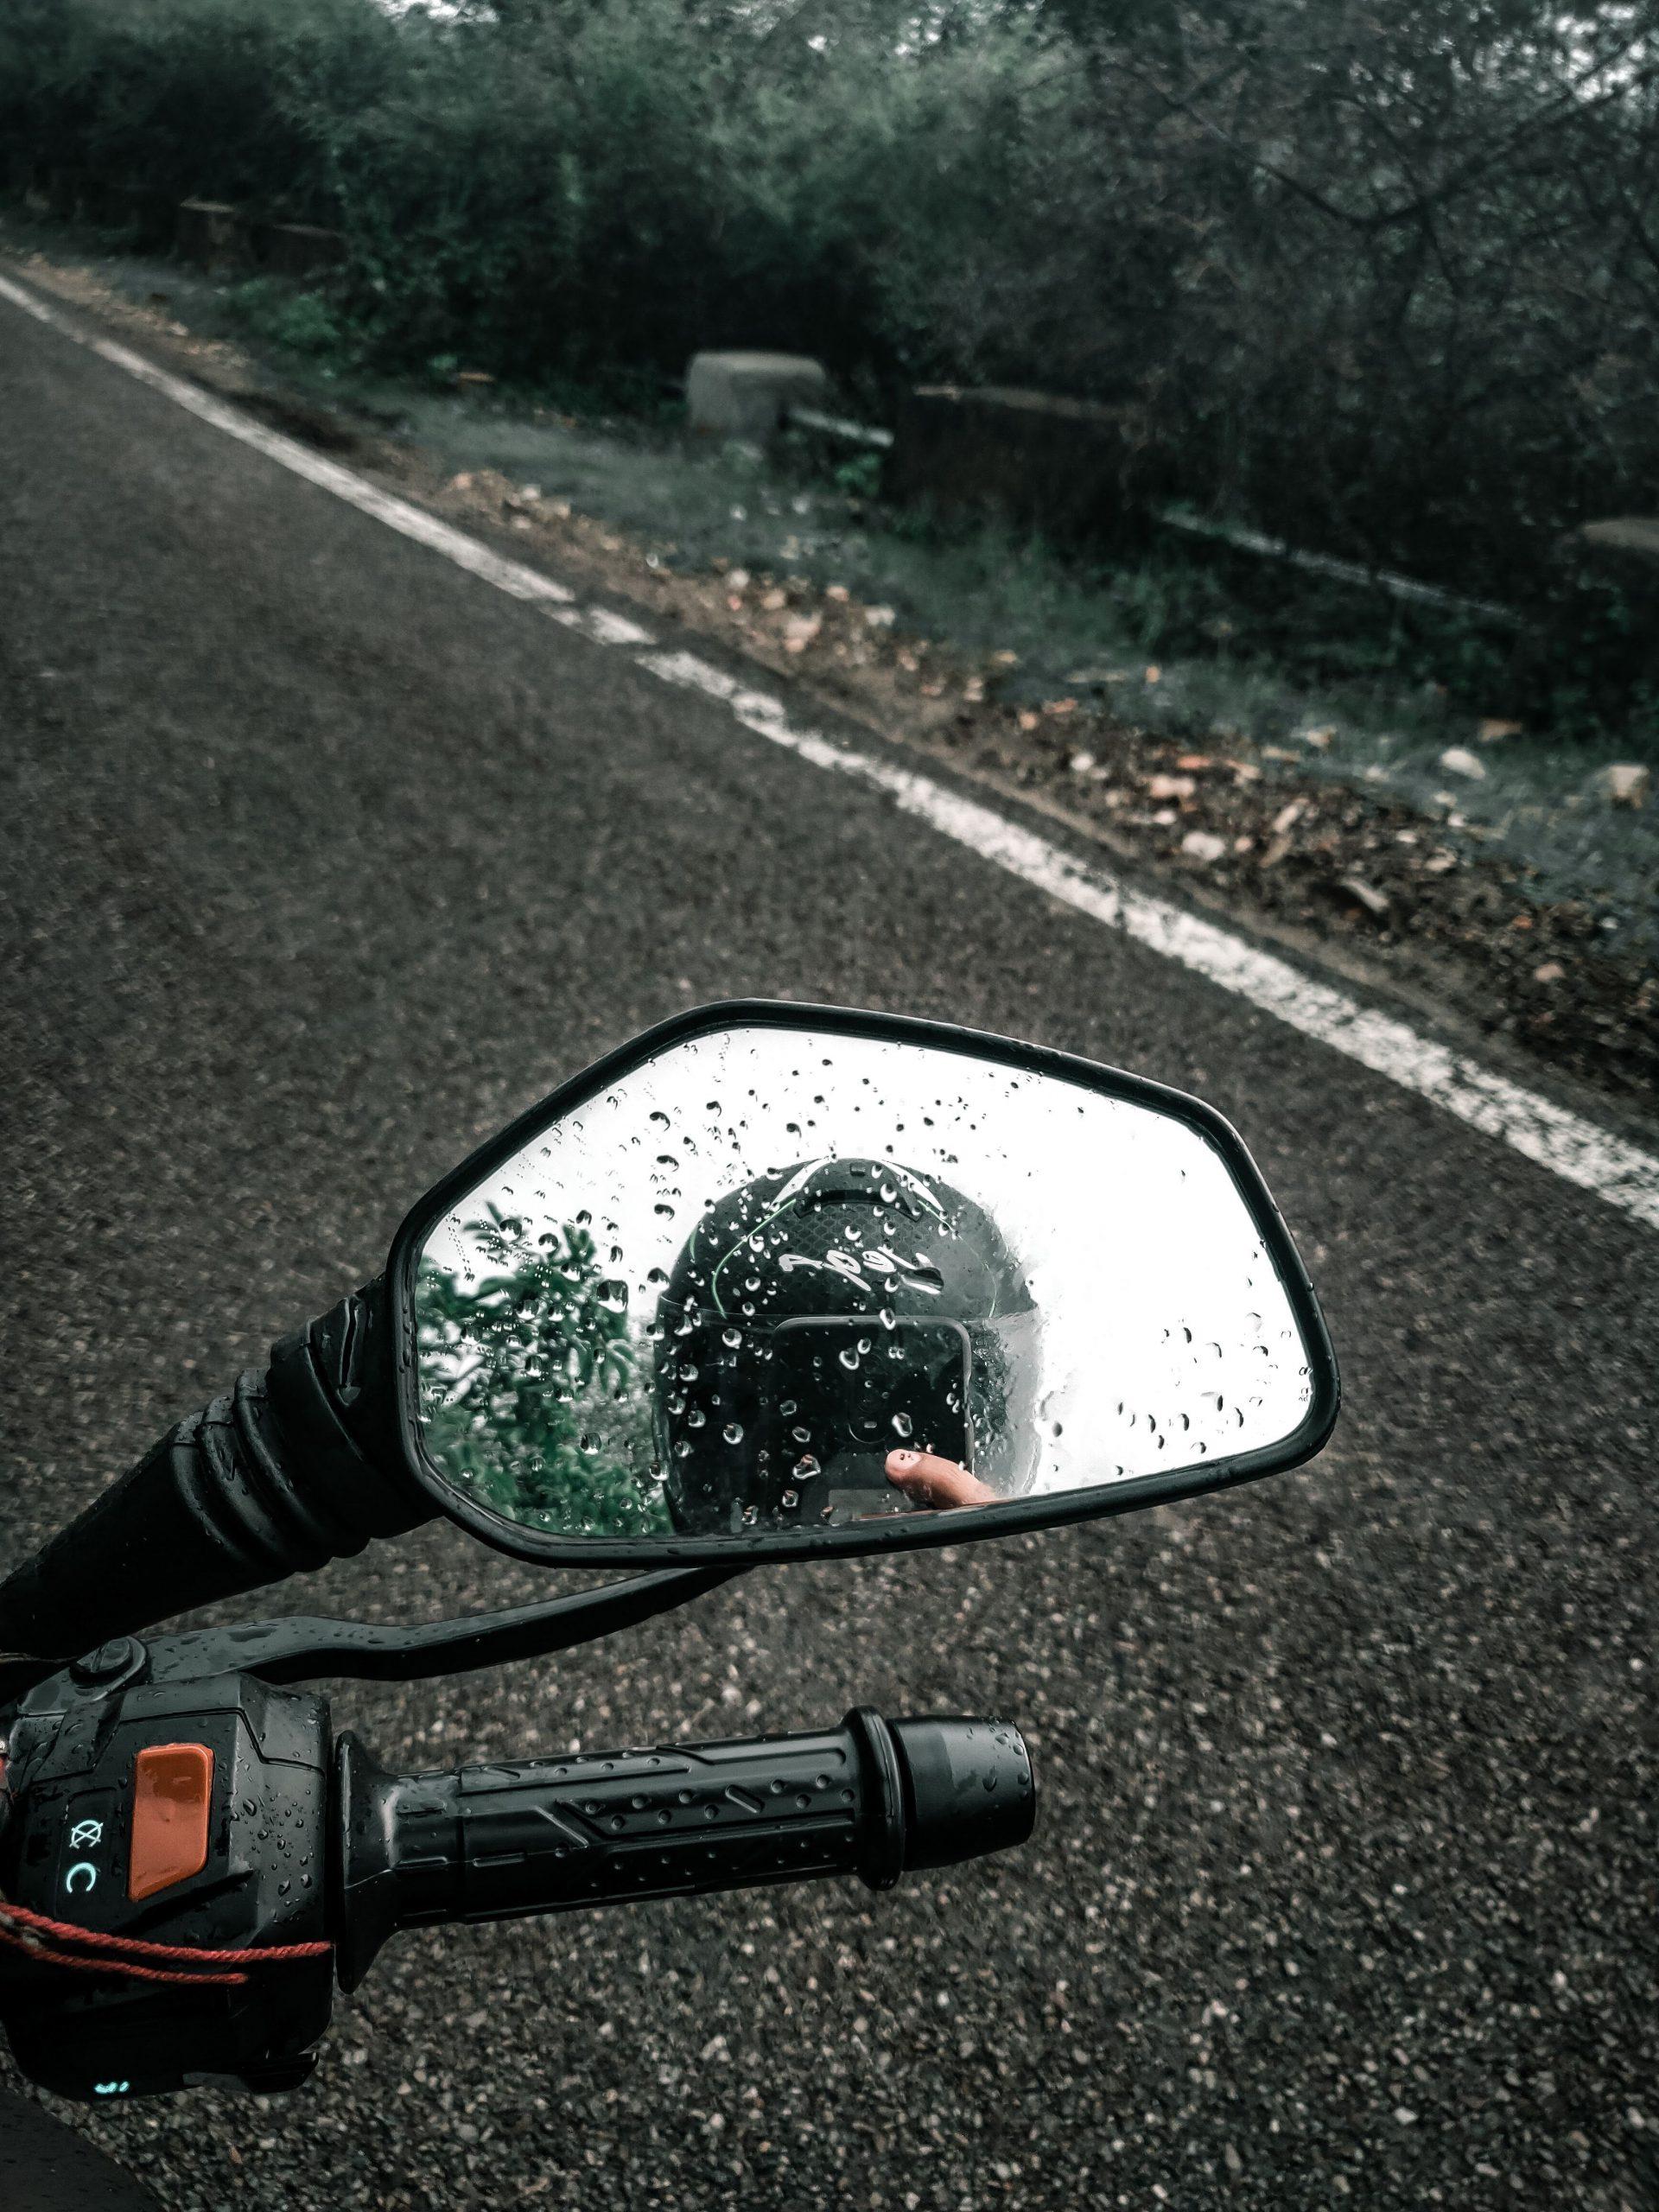 Rear view mirror of a bike